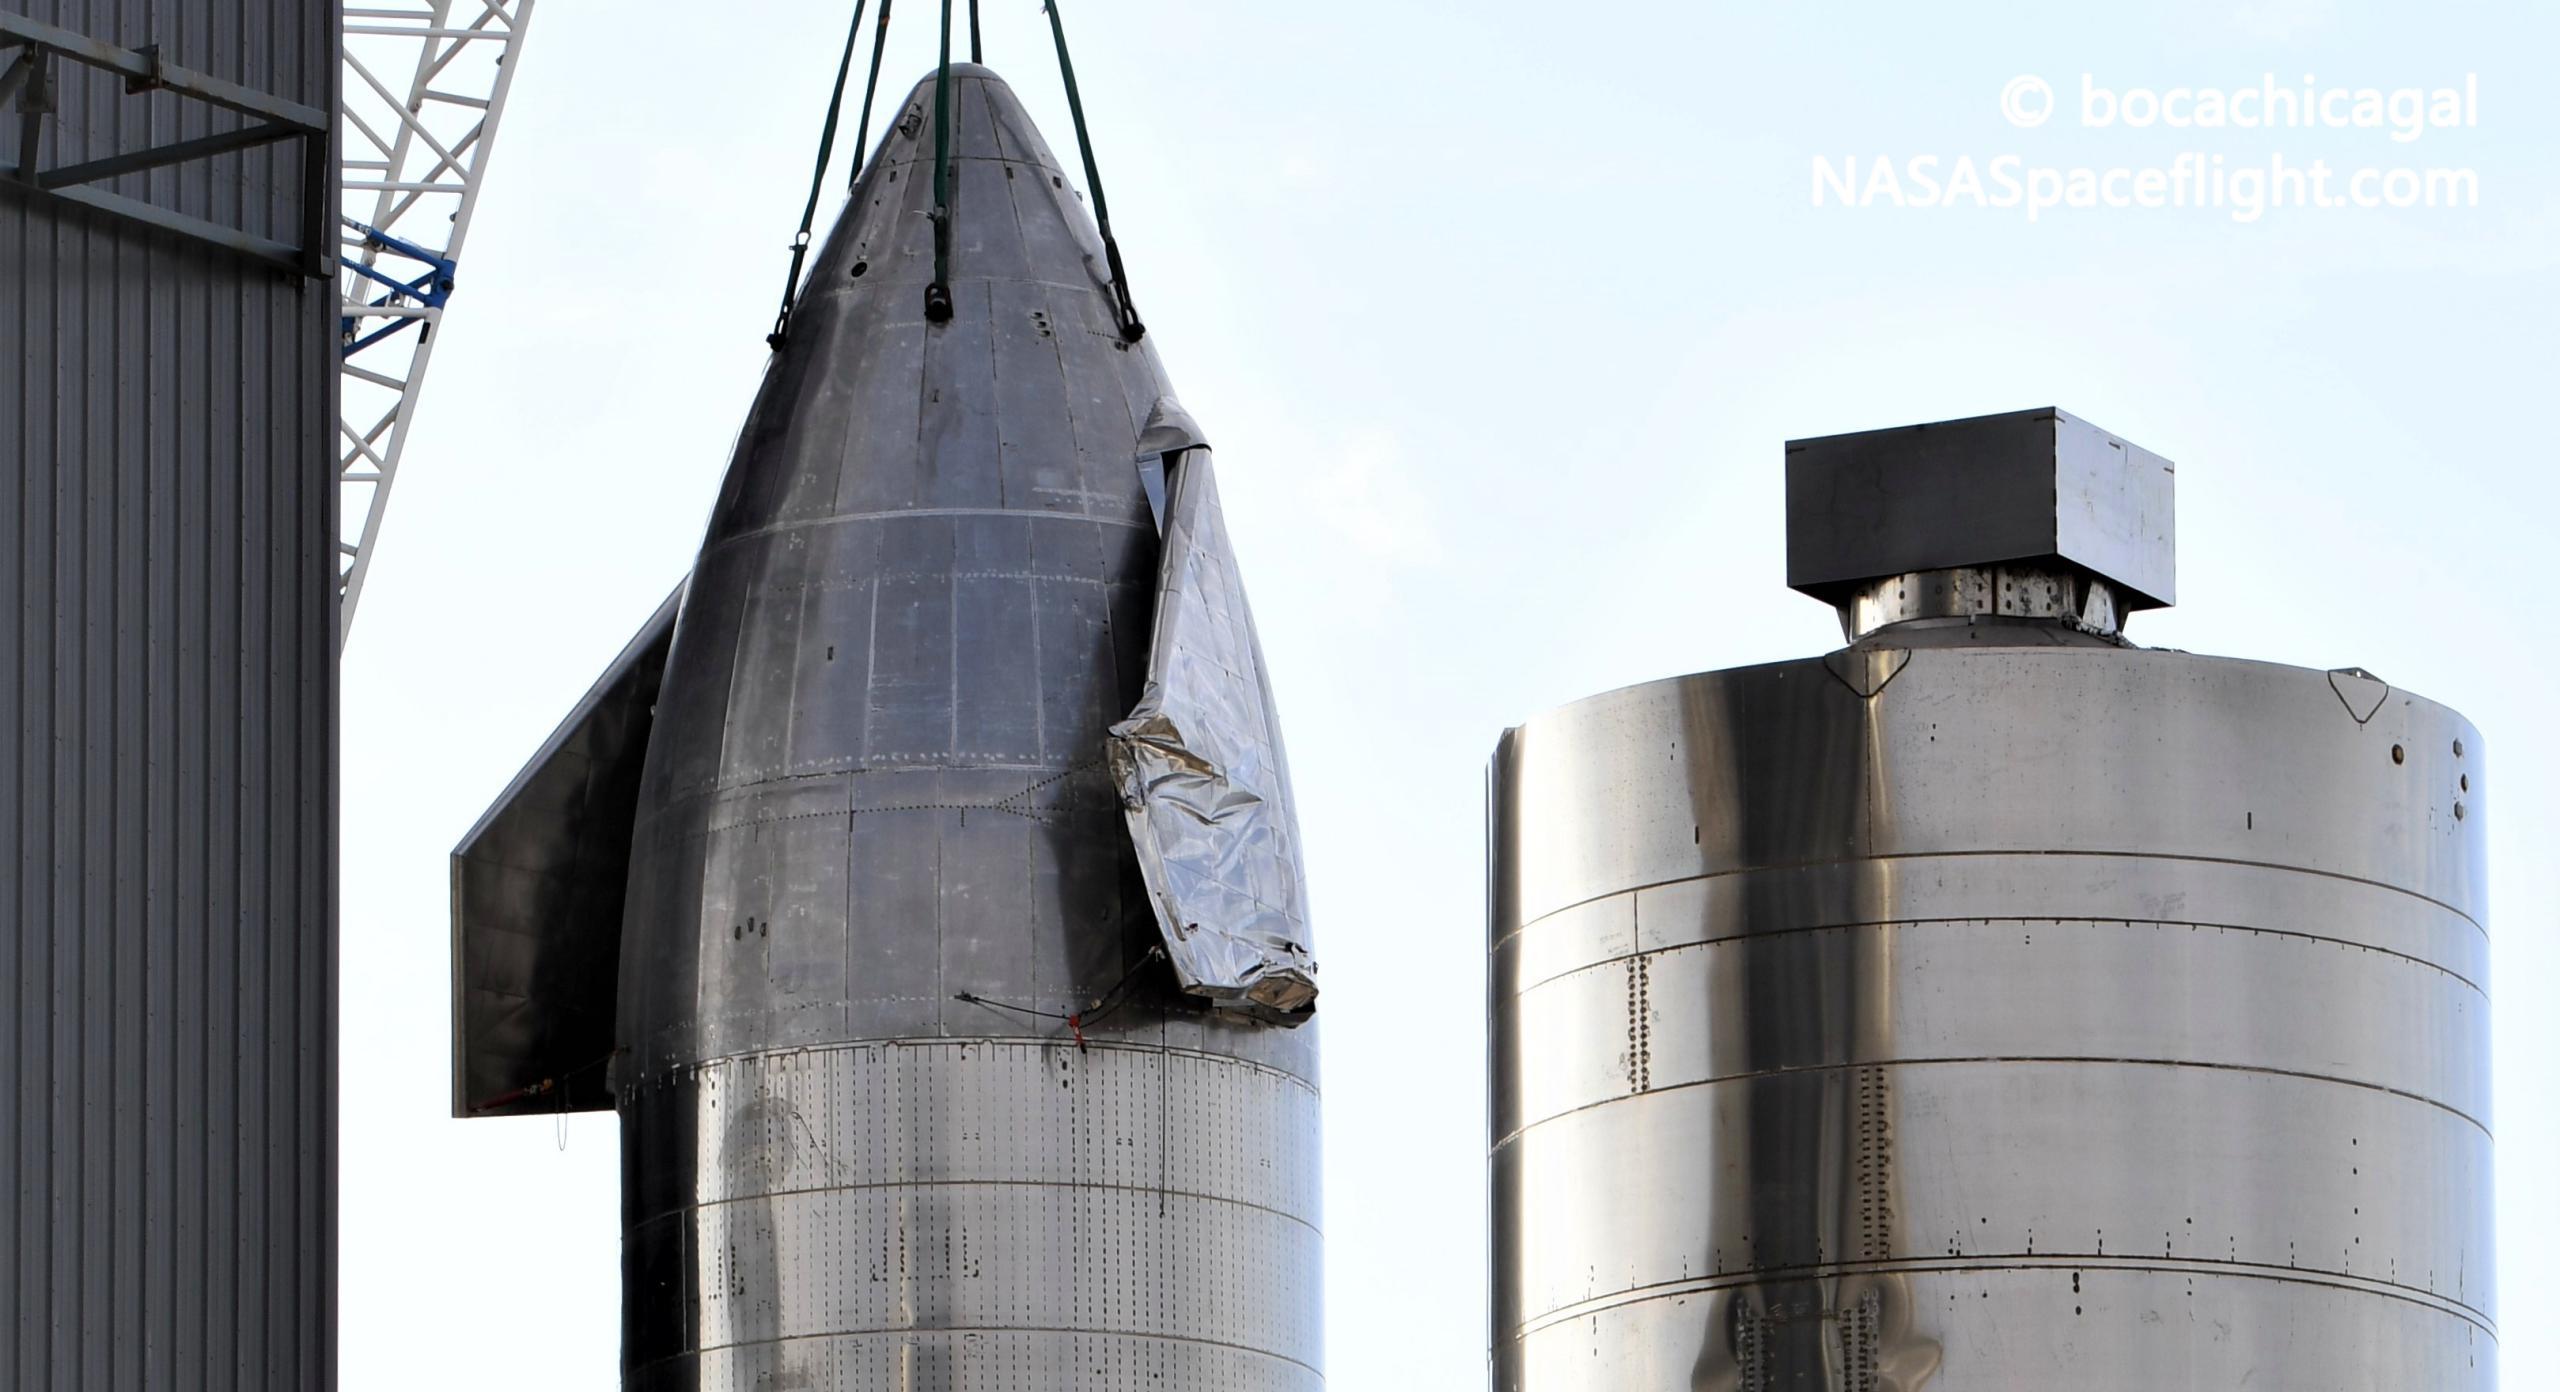 Starship Boca Chica 121420 (NASASpaceflight – bocachicagal) SN9 recovery + SN5 1 (c)